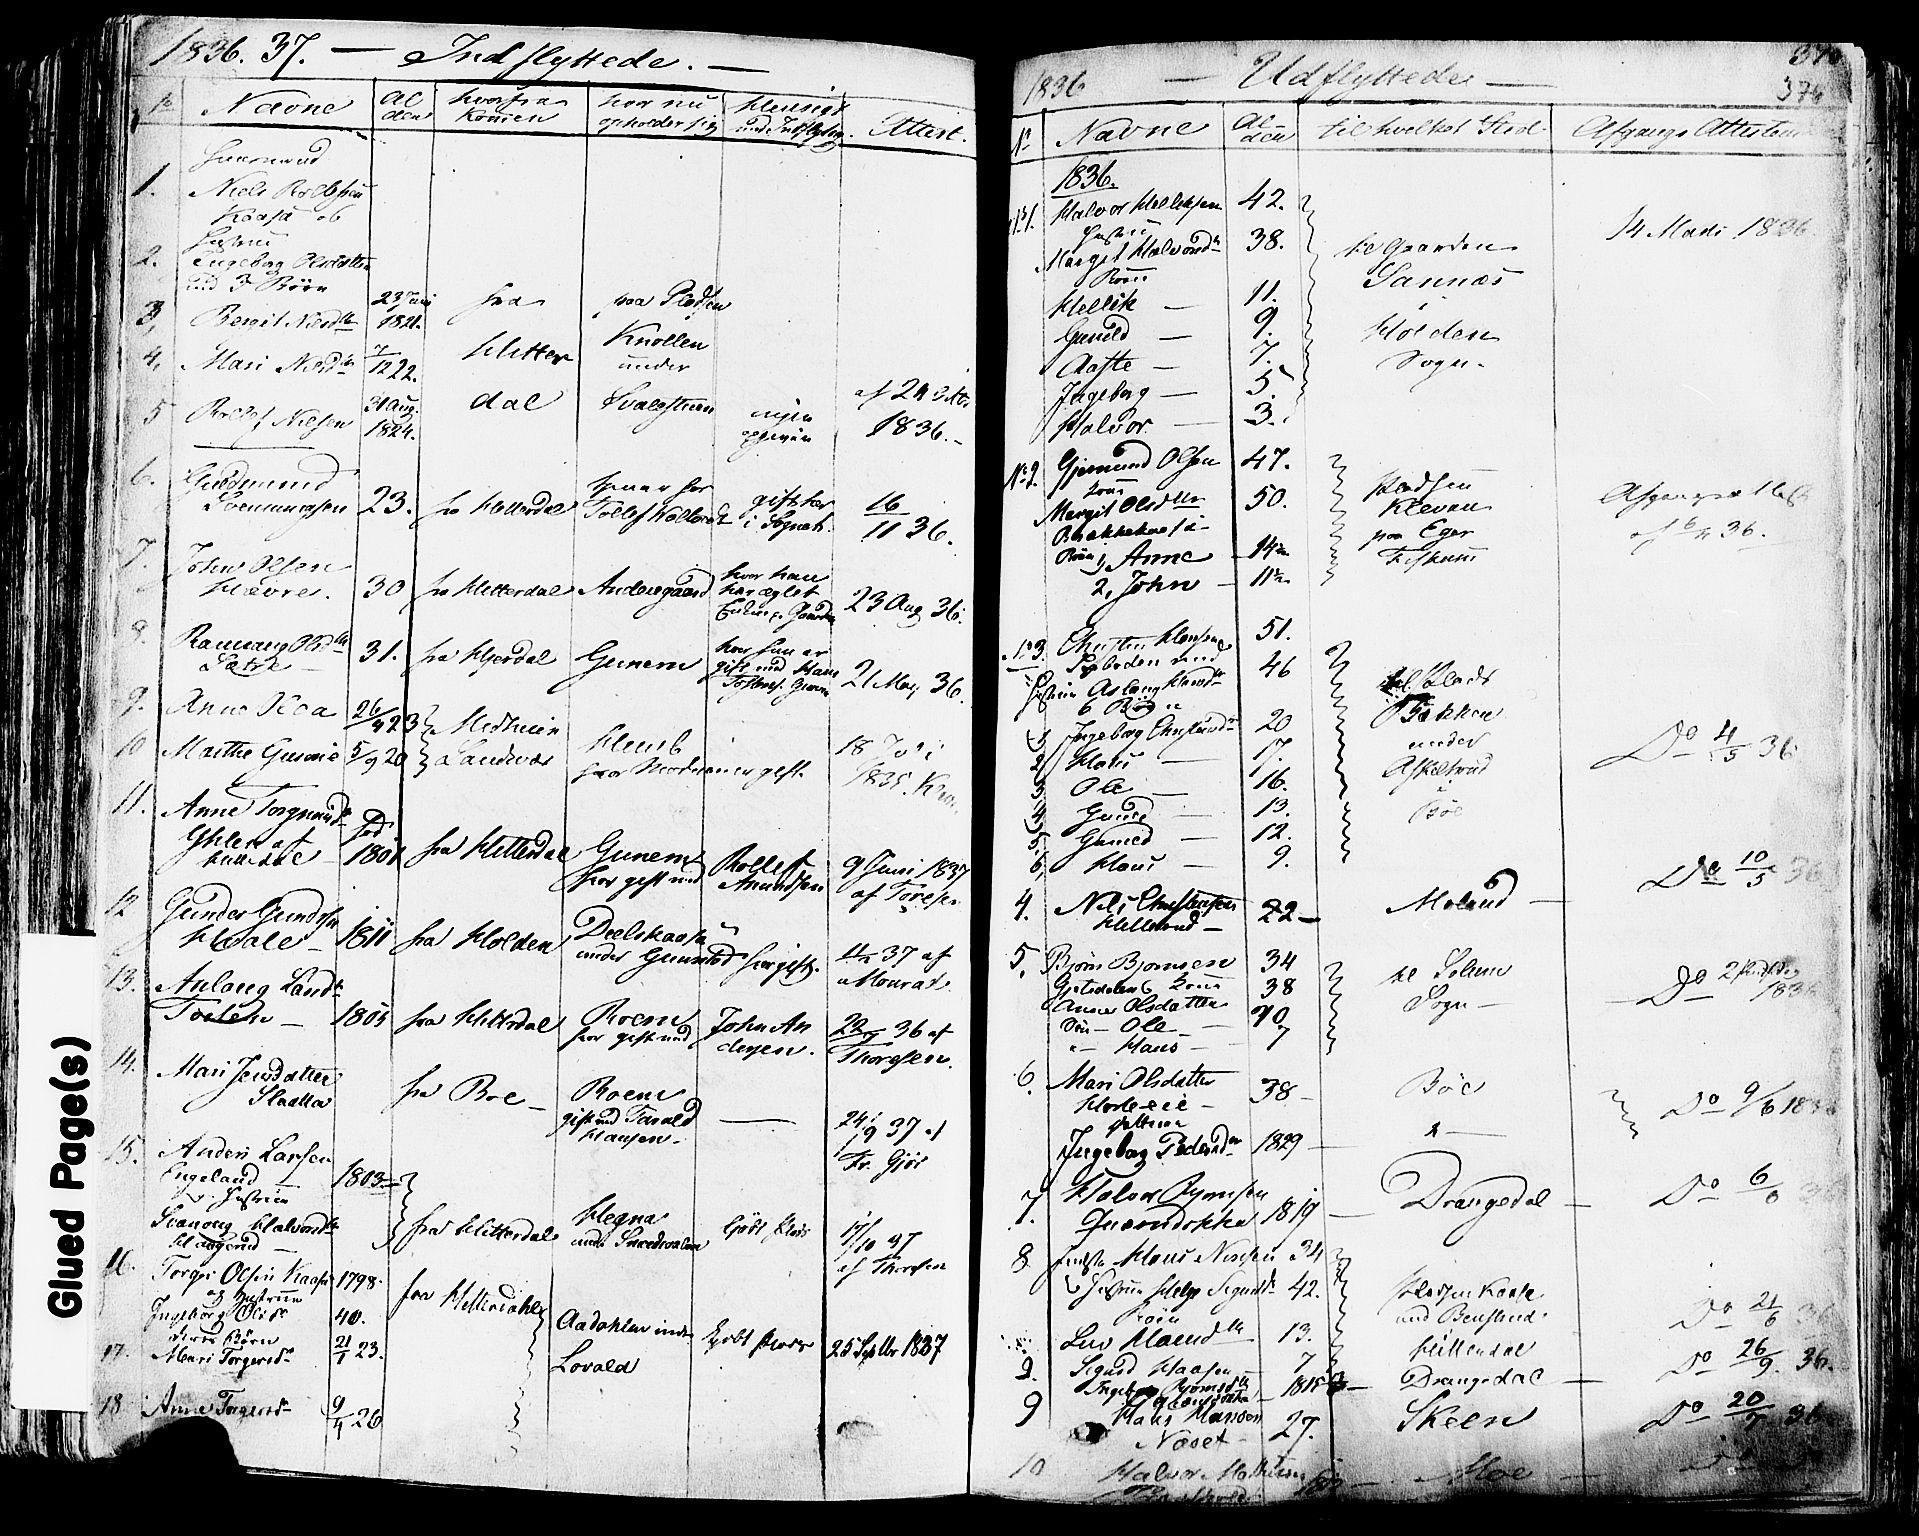 SAKO, Sauherad kirkebøker, F/Fa/L0006: Ministerialbok nr. I 6, 1827-1850, s. 376